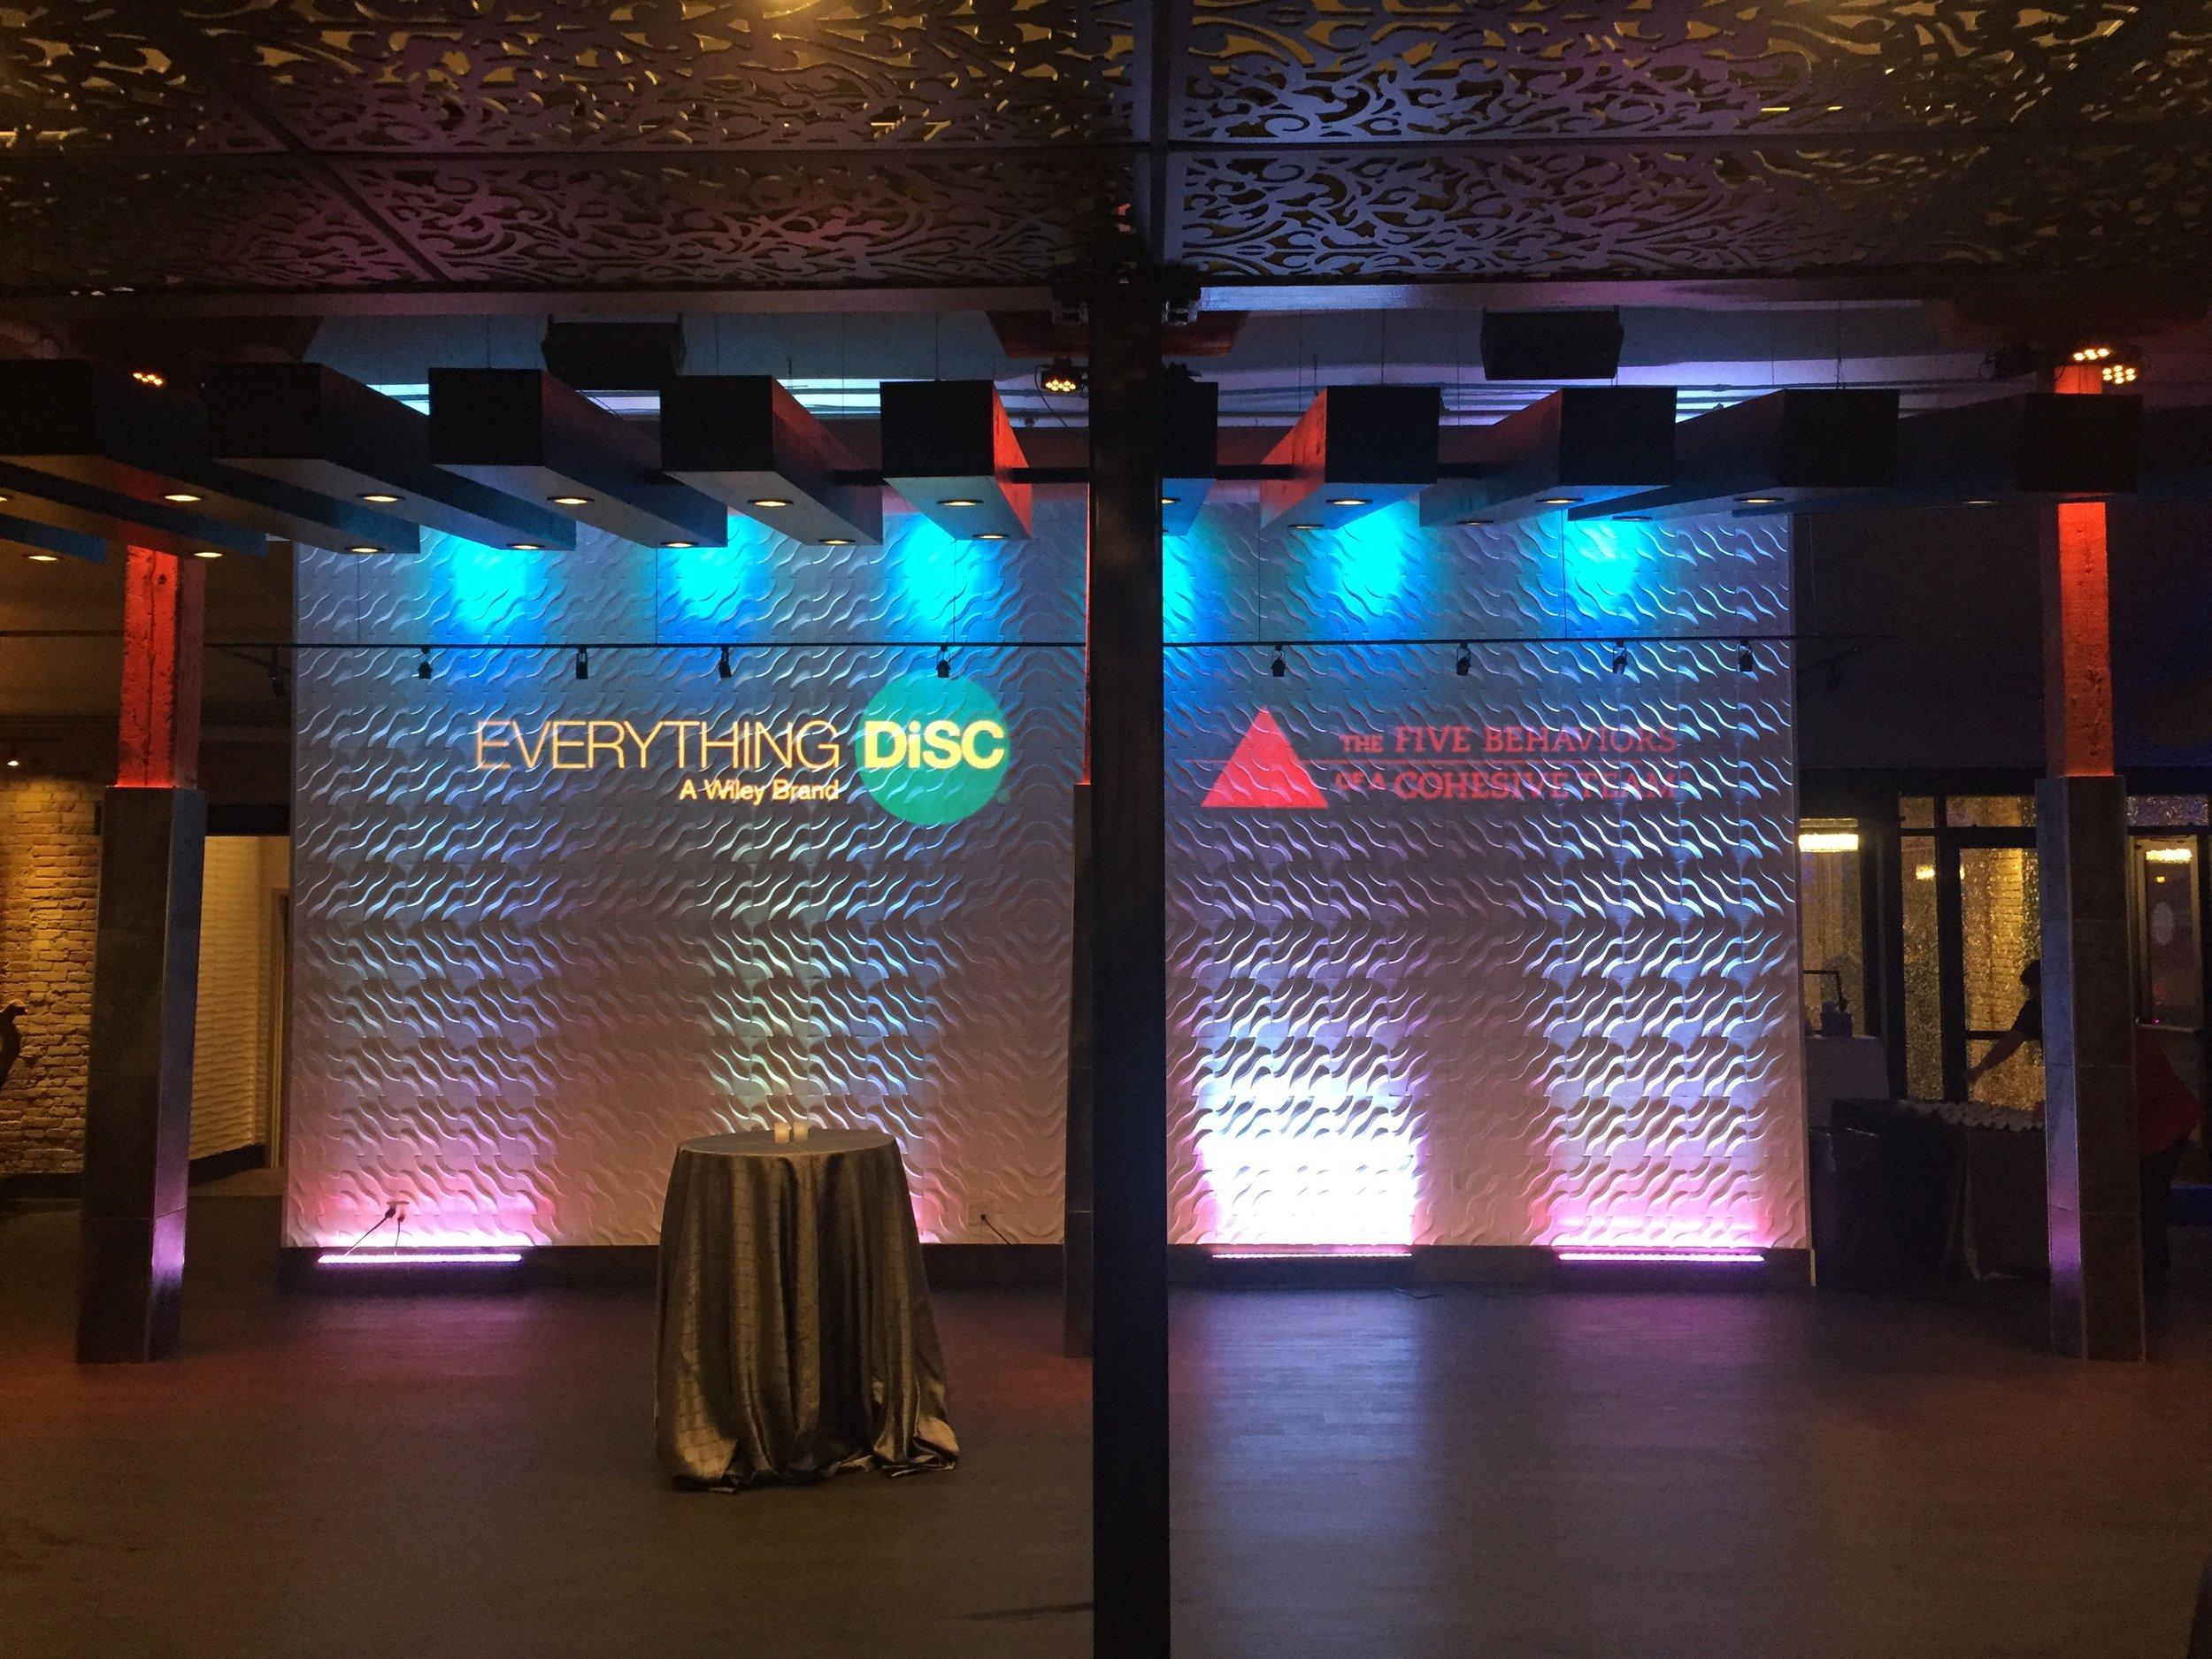 Photo of AV for You's Gobo set up at Minneapolis Event Center.